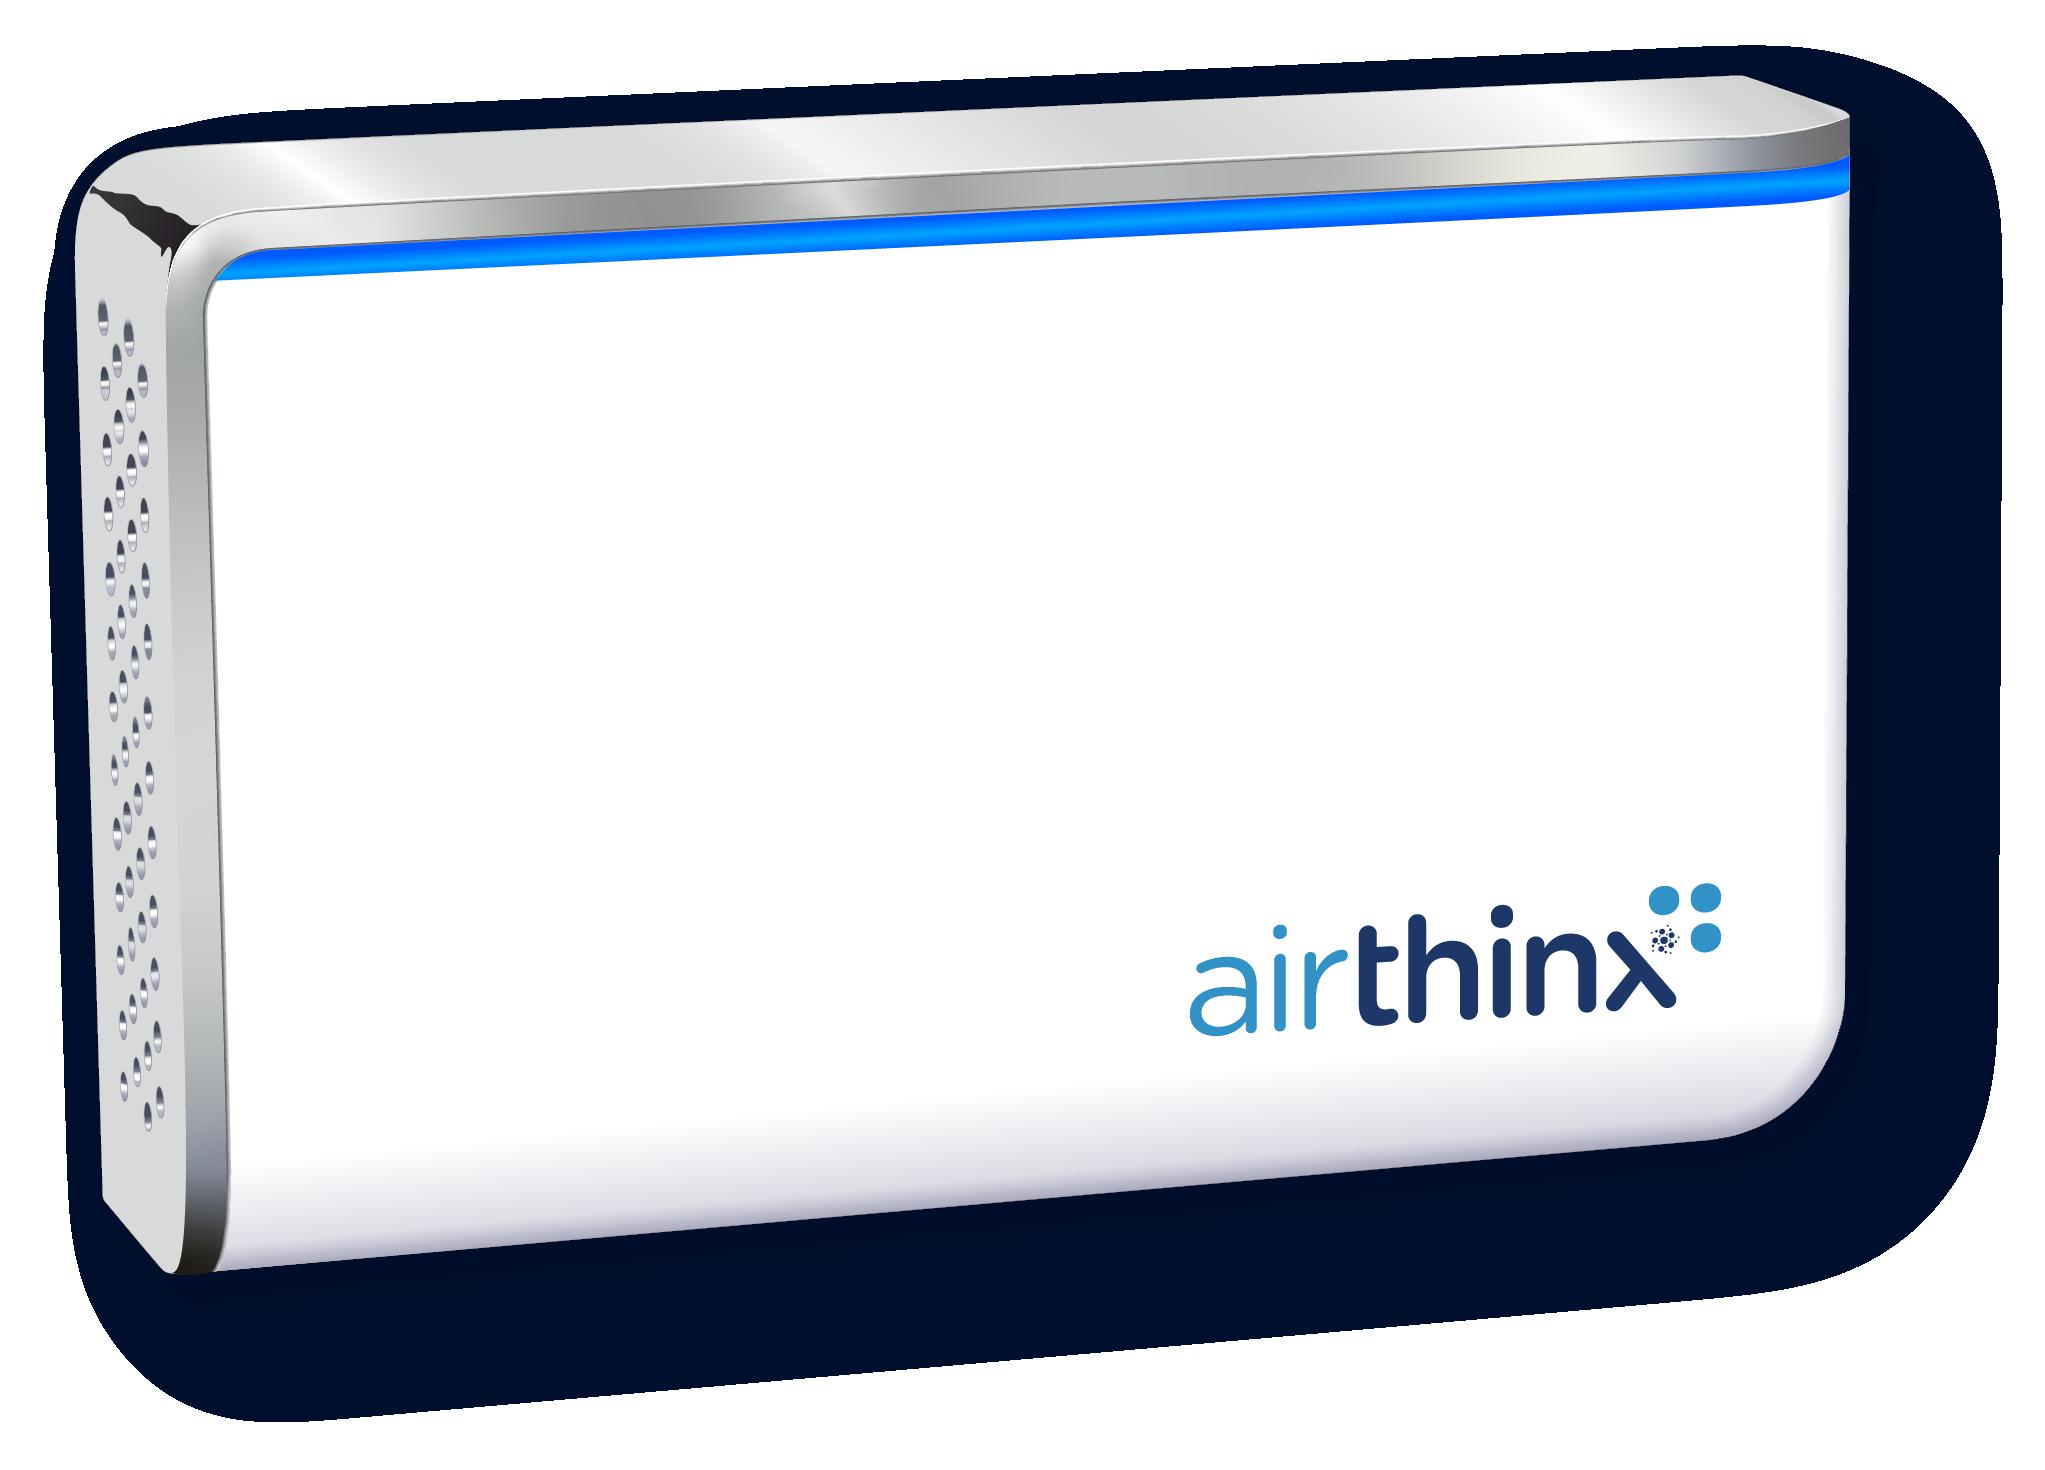 Airthinx